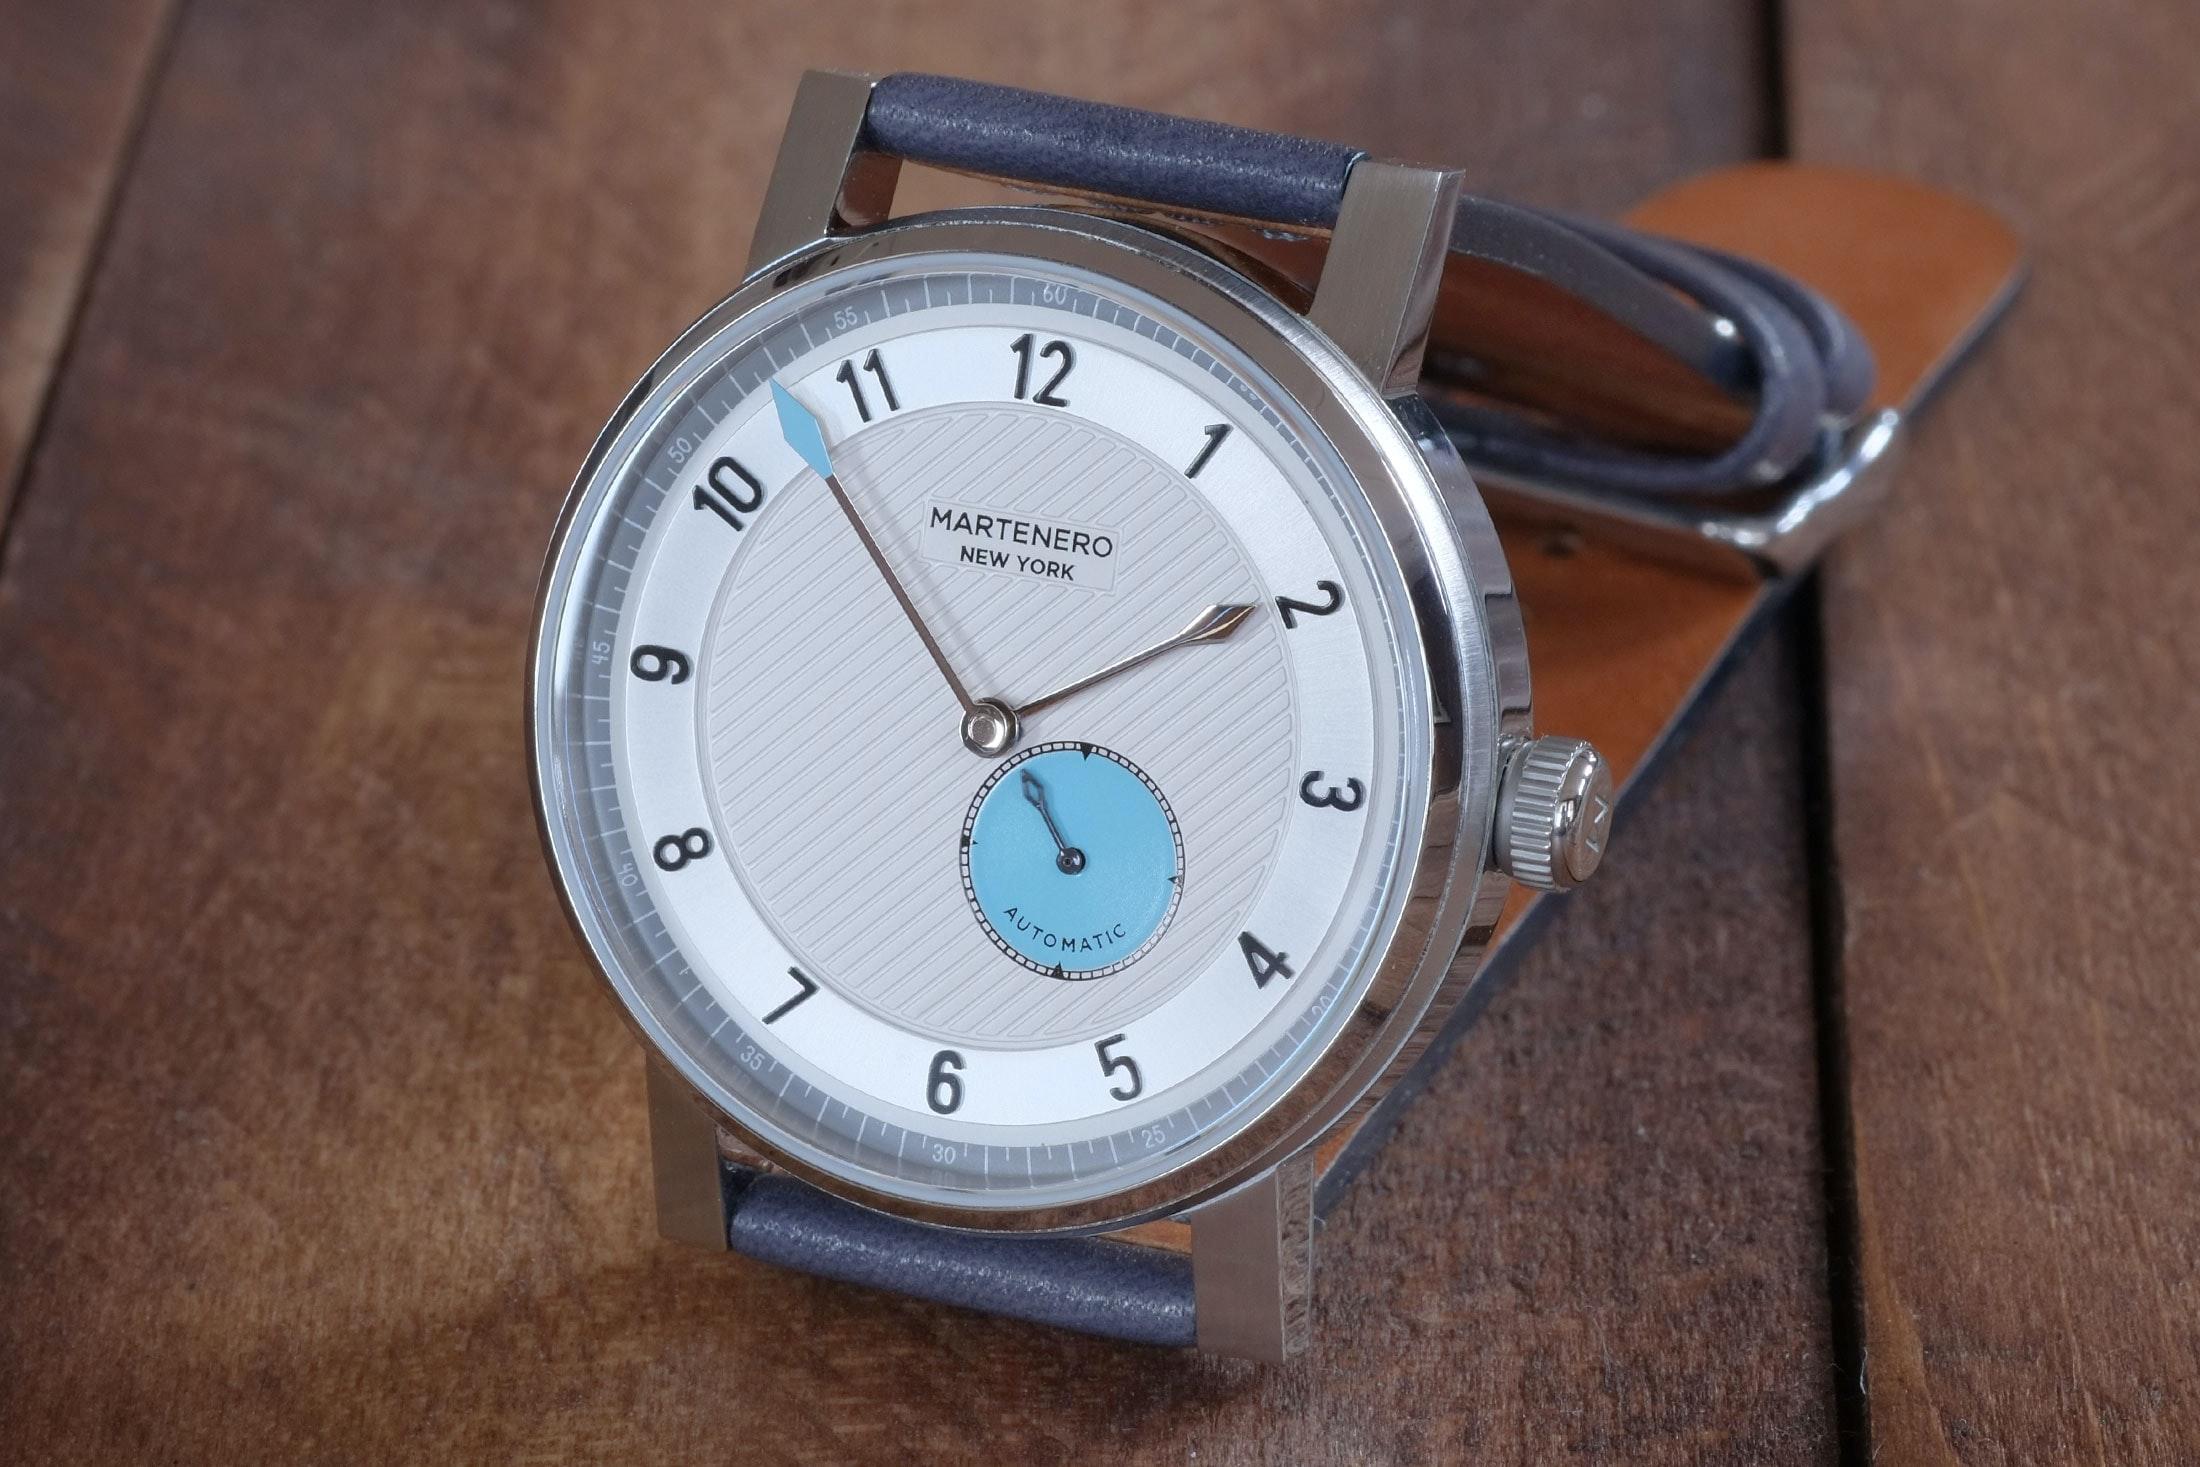 silver dial martenero edgemere Hands-On: The Martenero Edgemere, A Marine Chronometer-Inspired Watch Designed In New York Hands-On: The Martenero Edgemere, A Marine Chronometer-Inspired Watch Designed In New York martenero 10